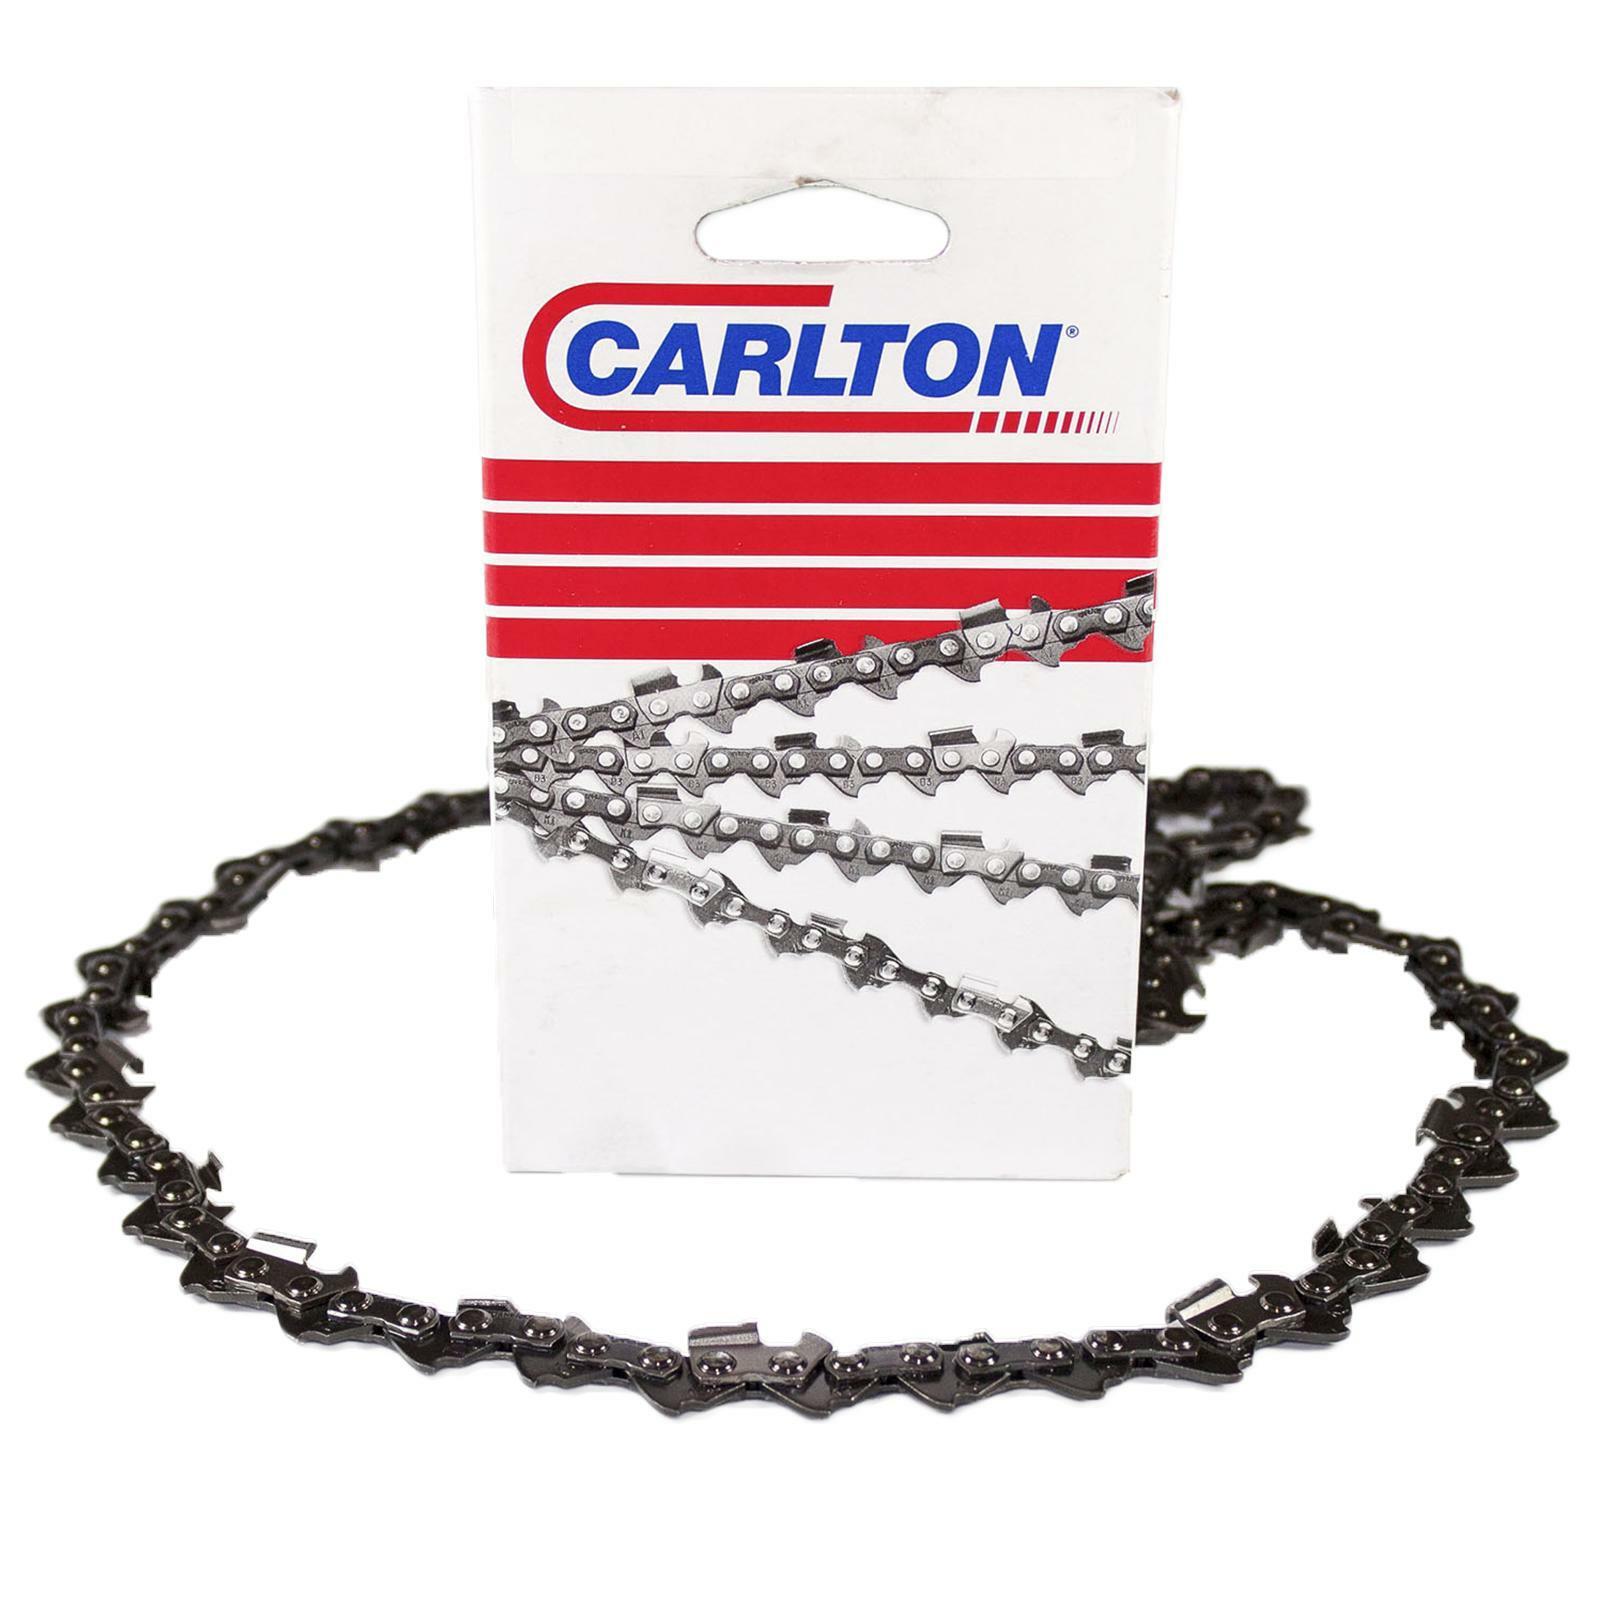 carlton catena per motosega 45 3.25 sp 1.5 carlton 78 maglie